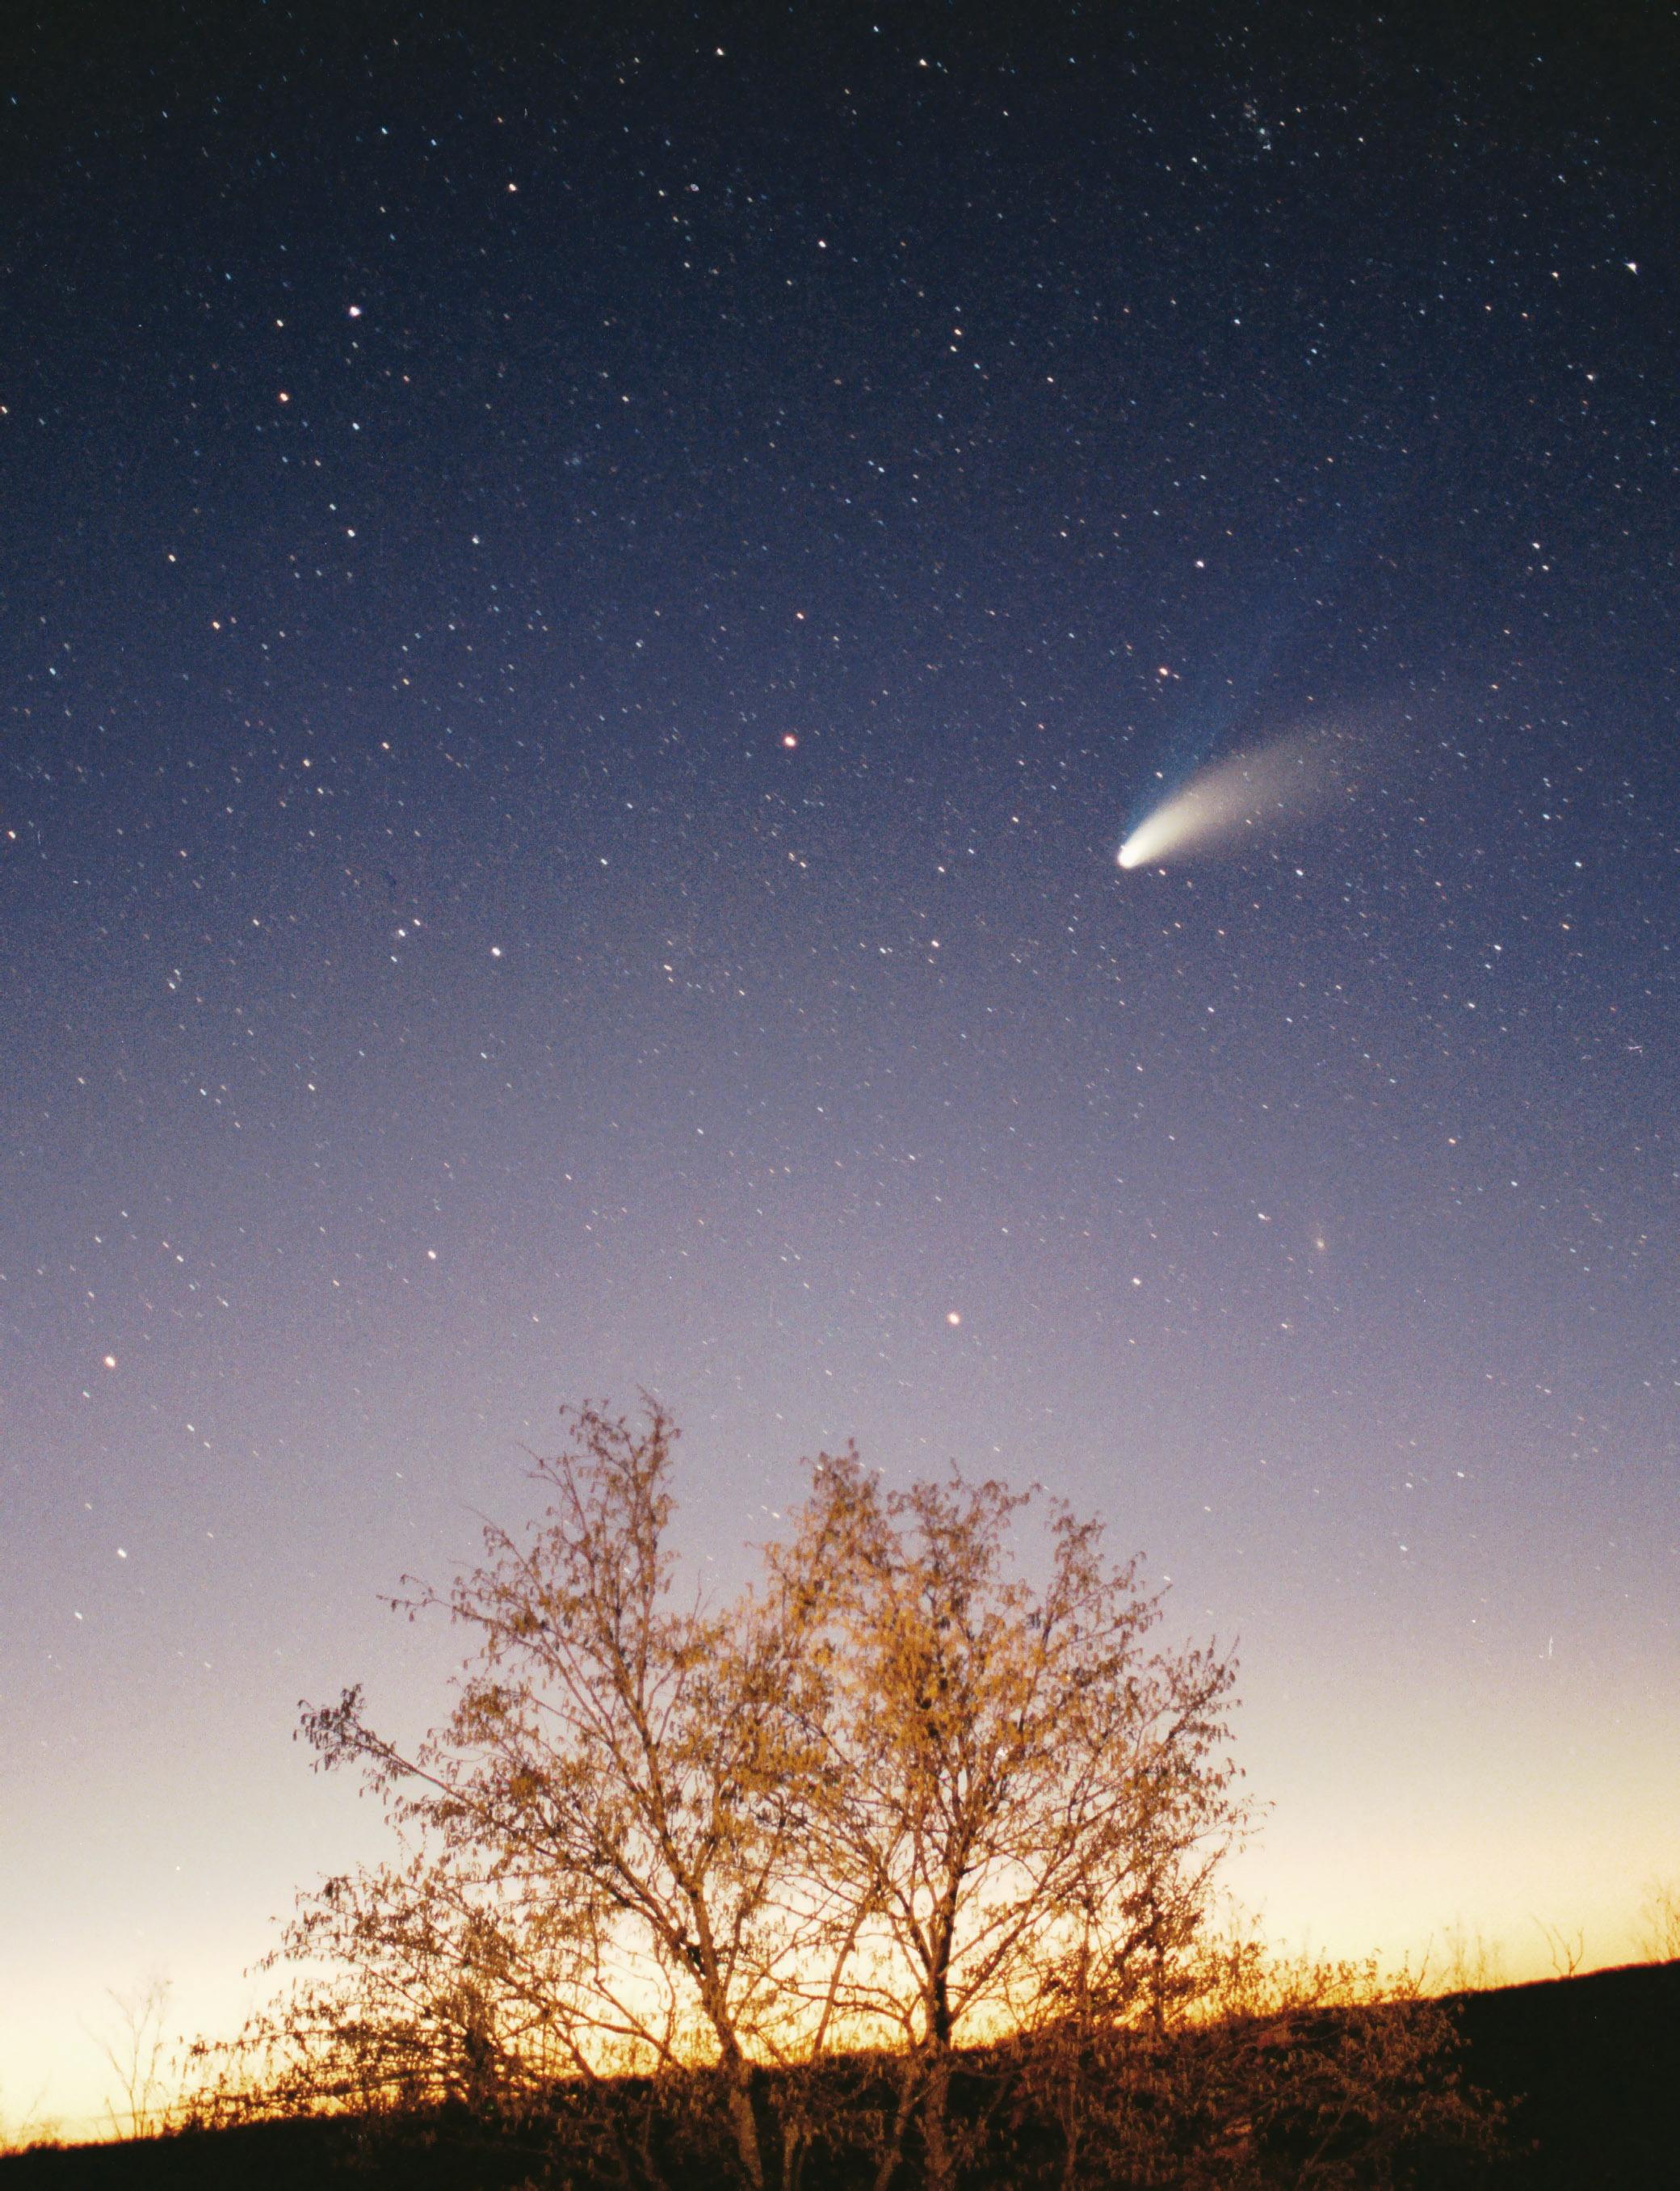 https://i0.wp.com/upload.wikimedia.org/wikipedia/commons/d/df/Comet-Hale-Bopp-29-03-1997_hires_adj.jpg